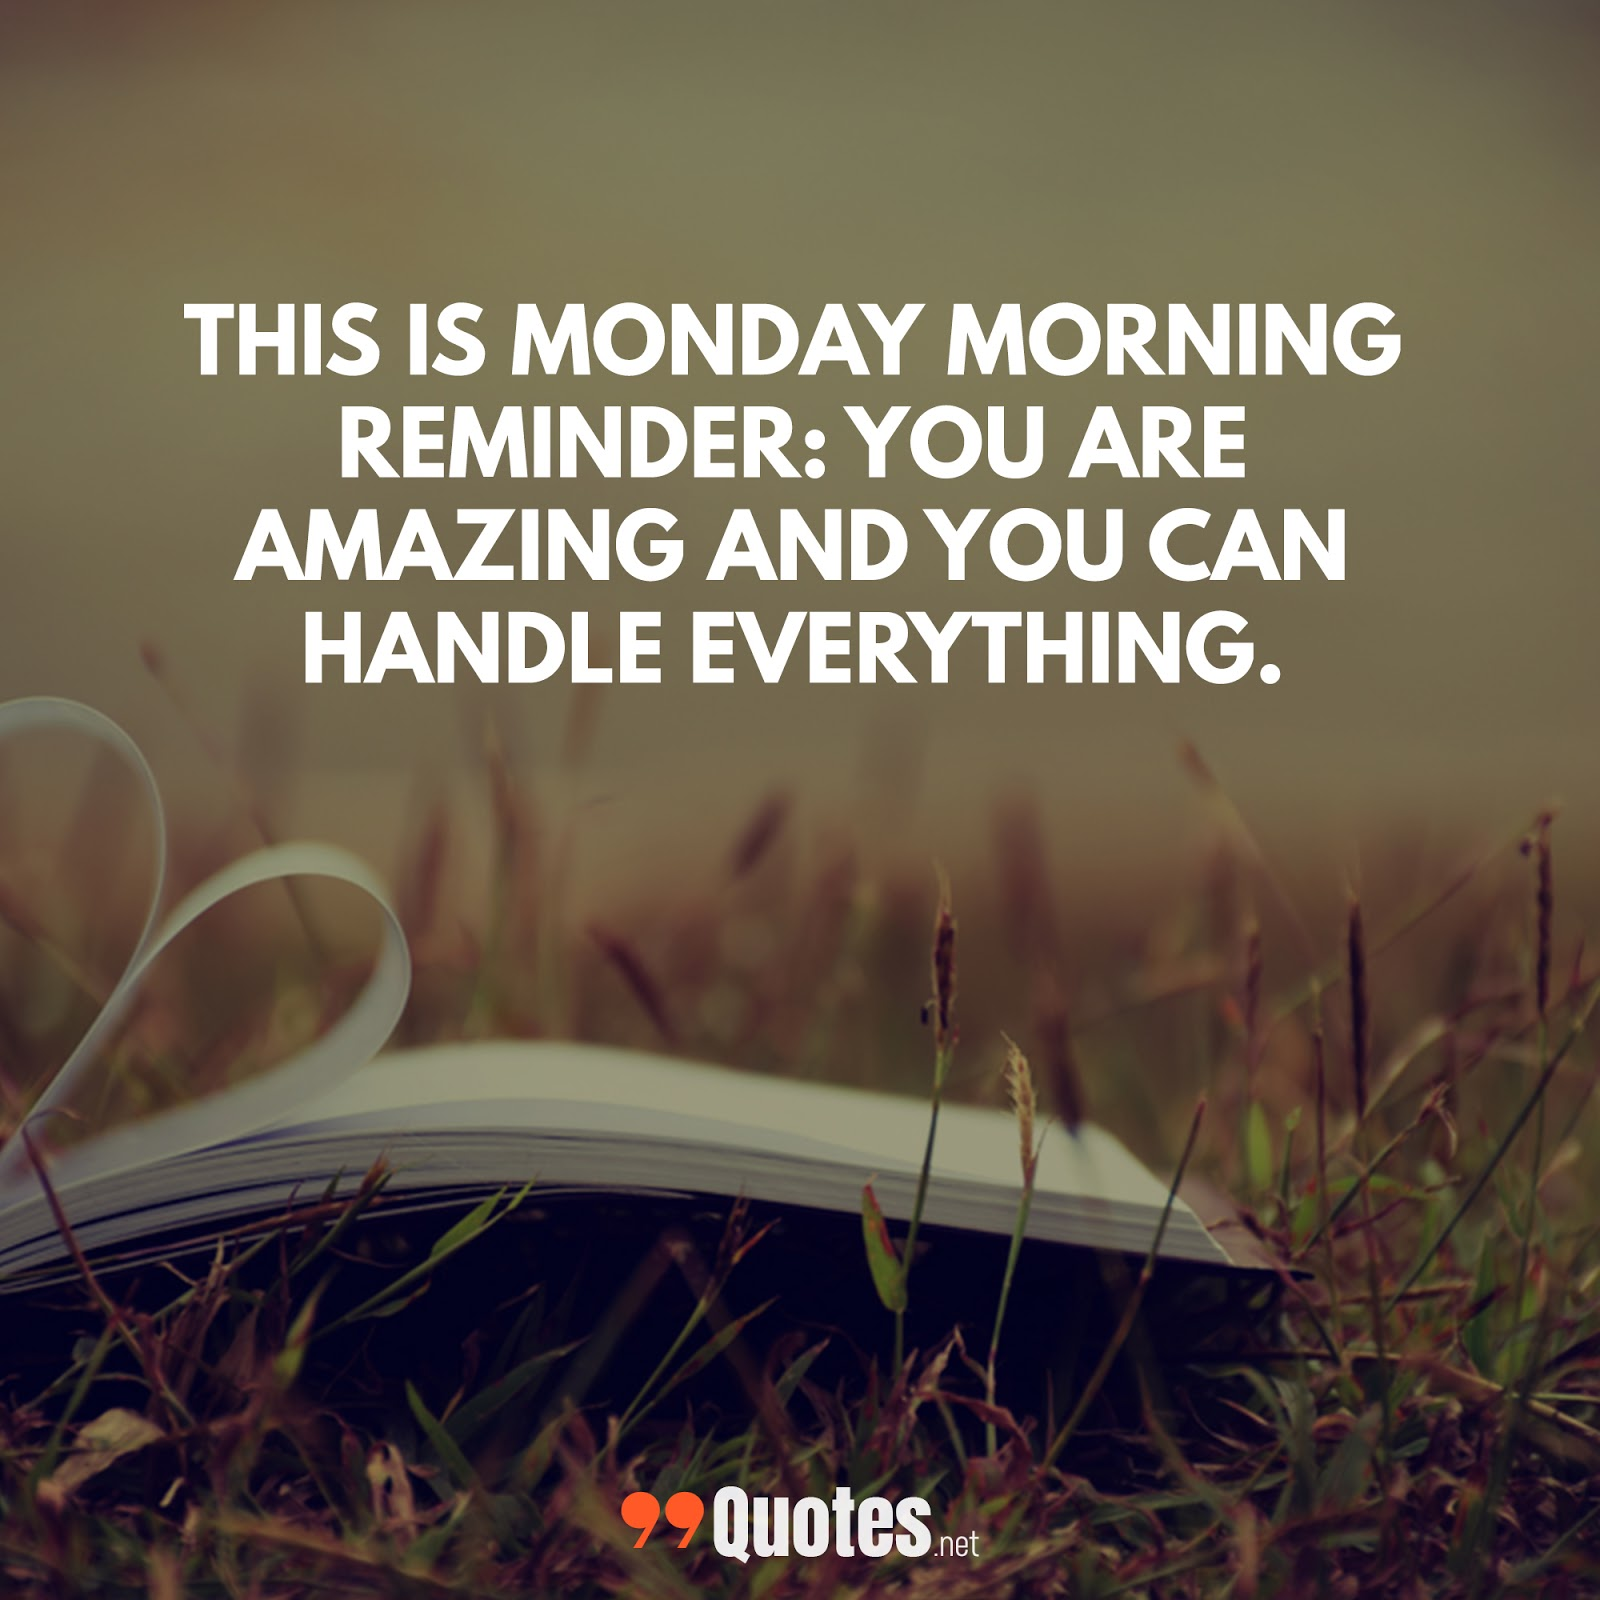 Monday Motivation For Employees Pinterest thumbnail